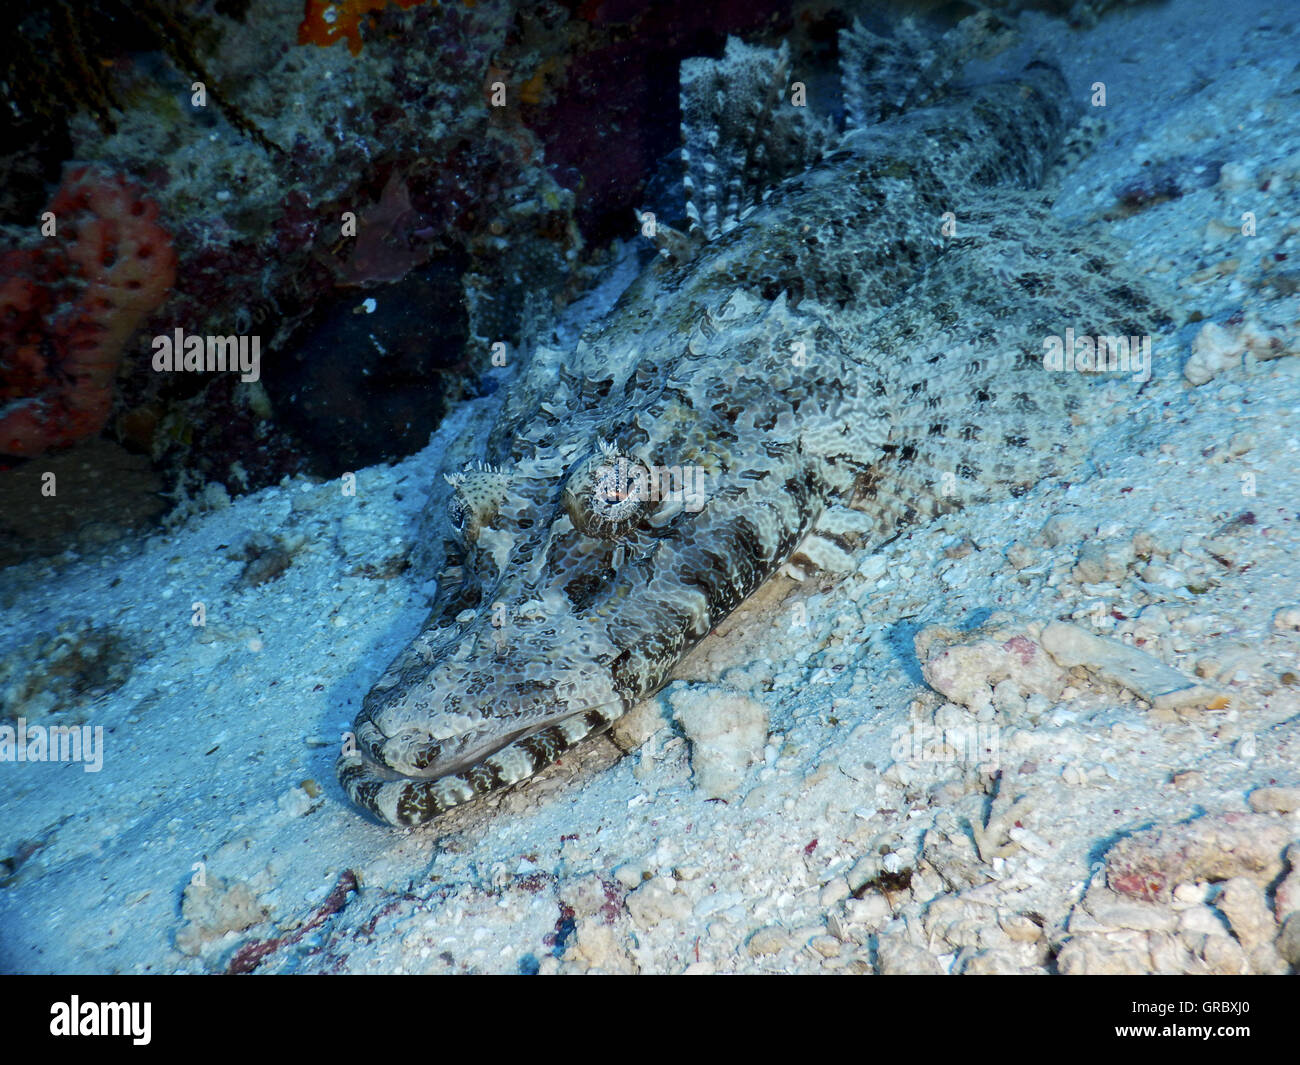 Flathead On Sand. Selayar, South Sulawesi, Indonesia - Stock Image